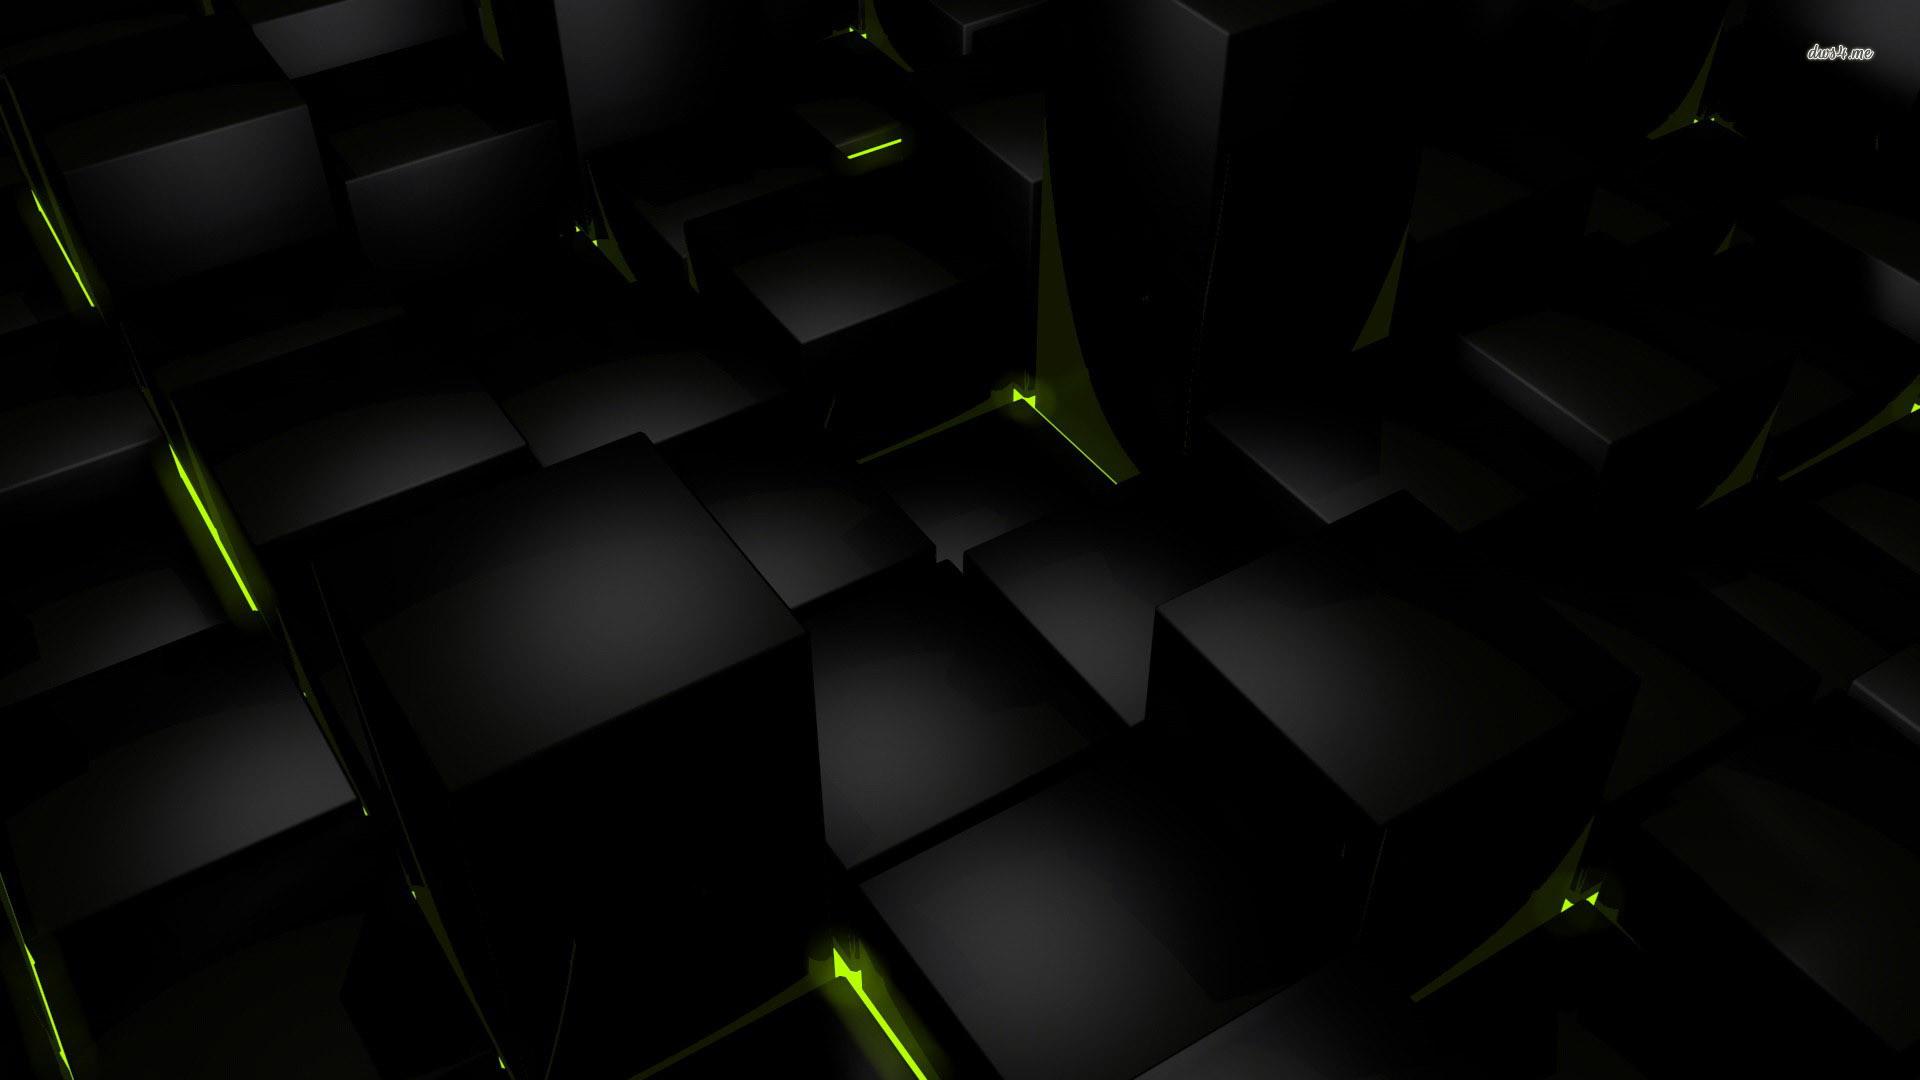 Black-and-green-wallpaper-22.jpg